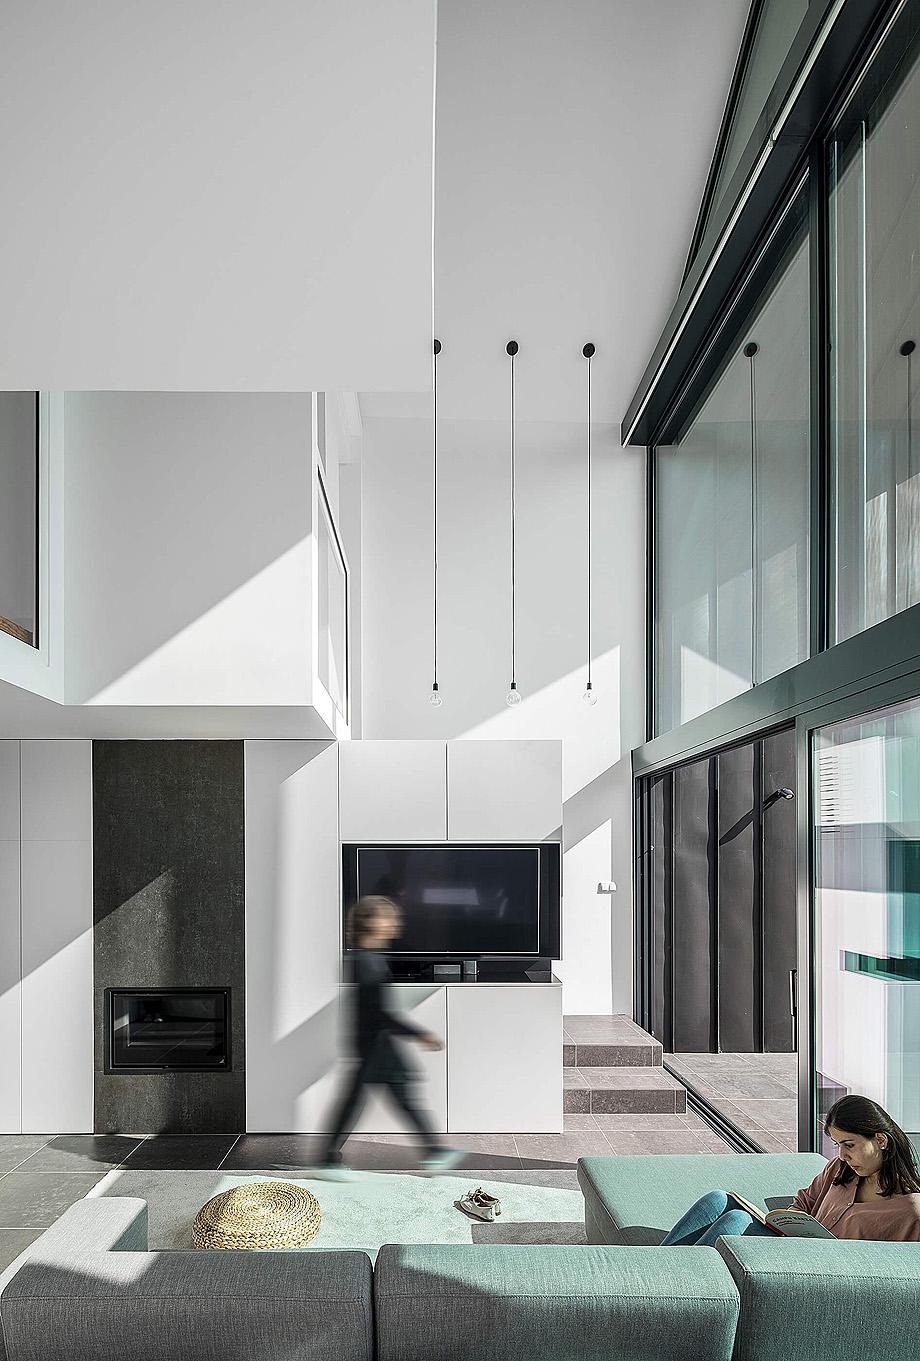 casa do arco de frari architecture network - foto ivo tavares (5)